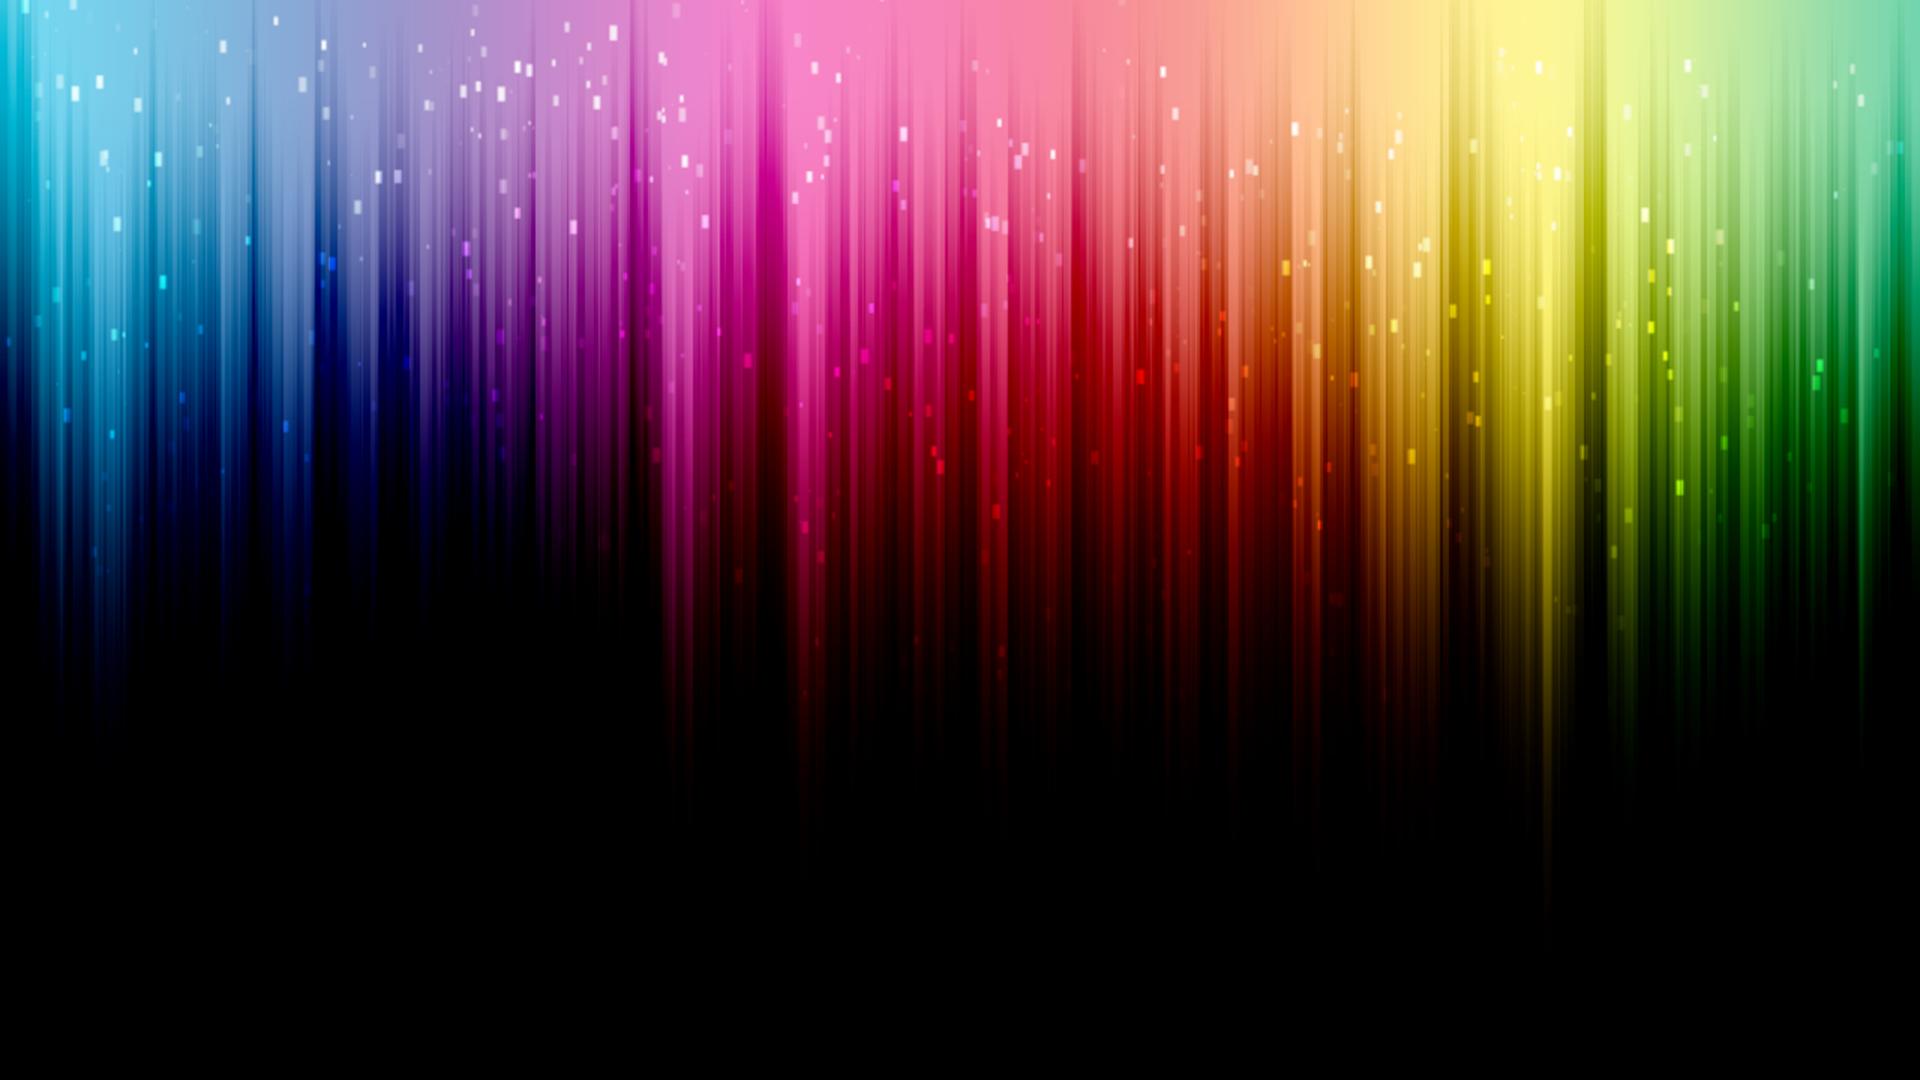 spectrum of light background - photo #11